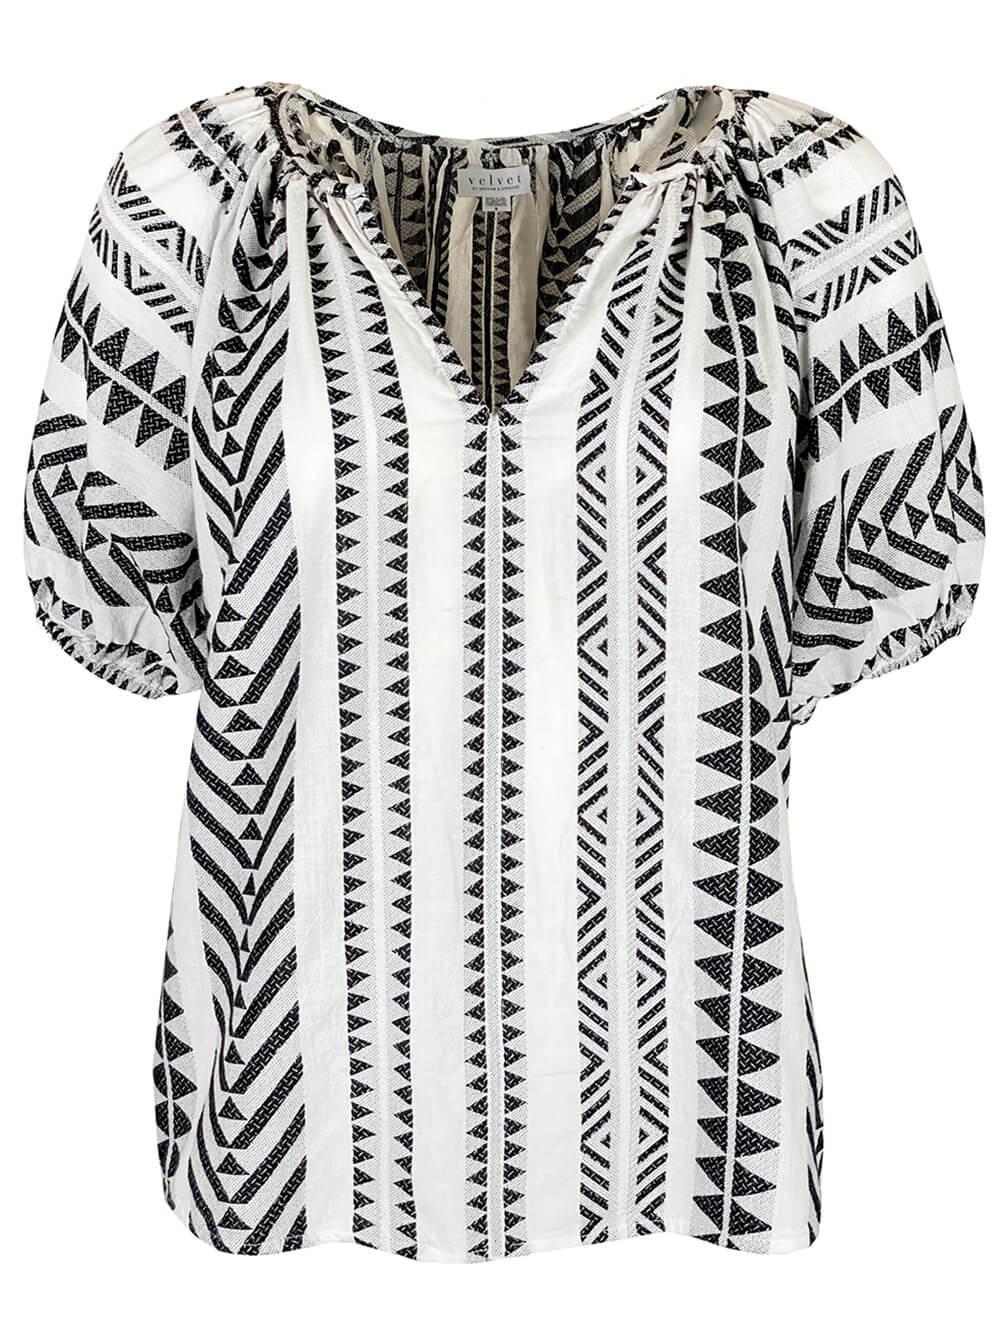 Jacquard Short Sleeve Top Item # ZARIA04